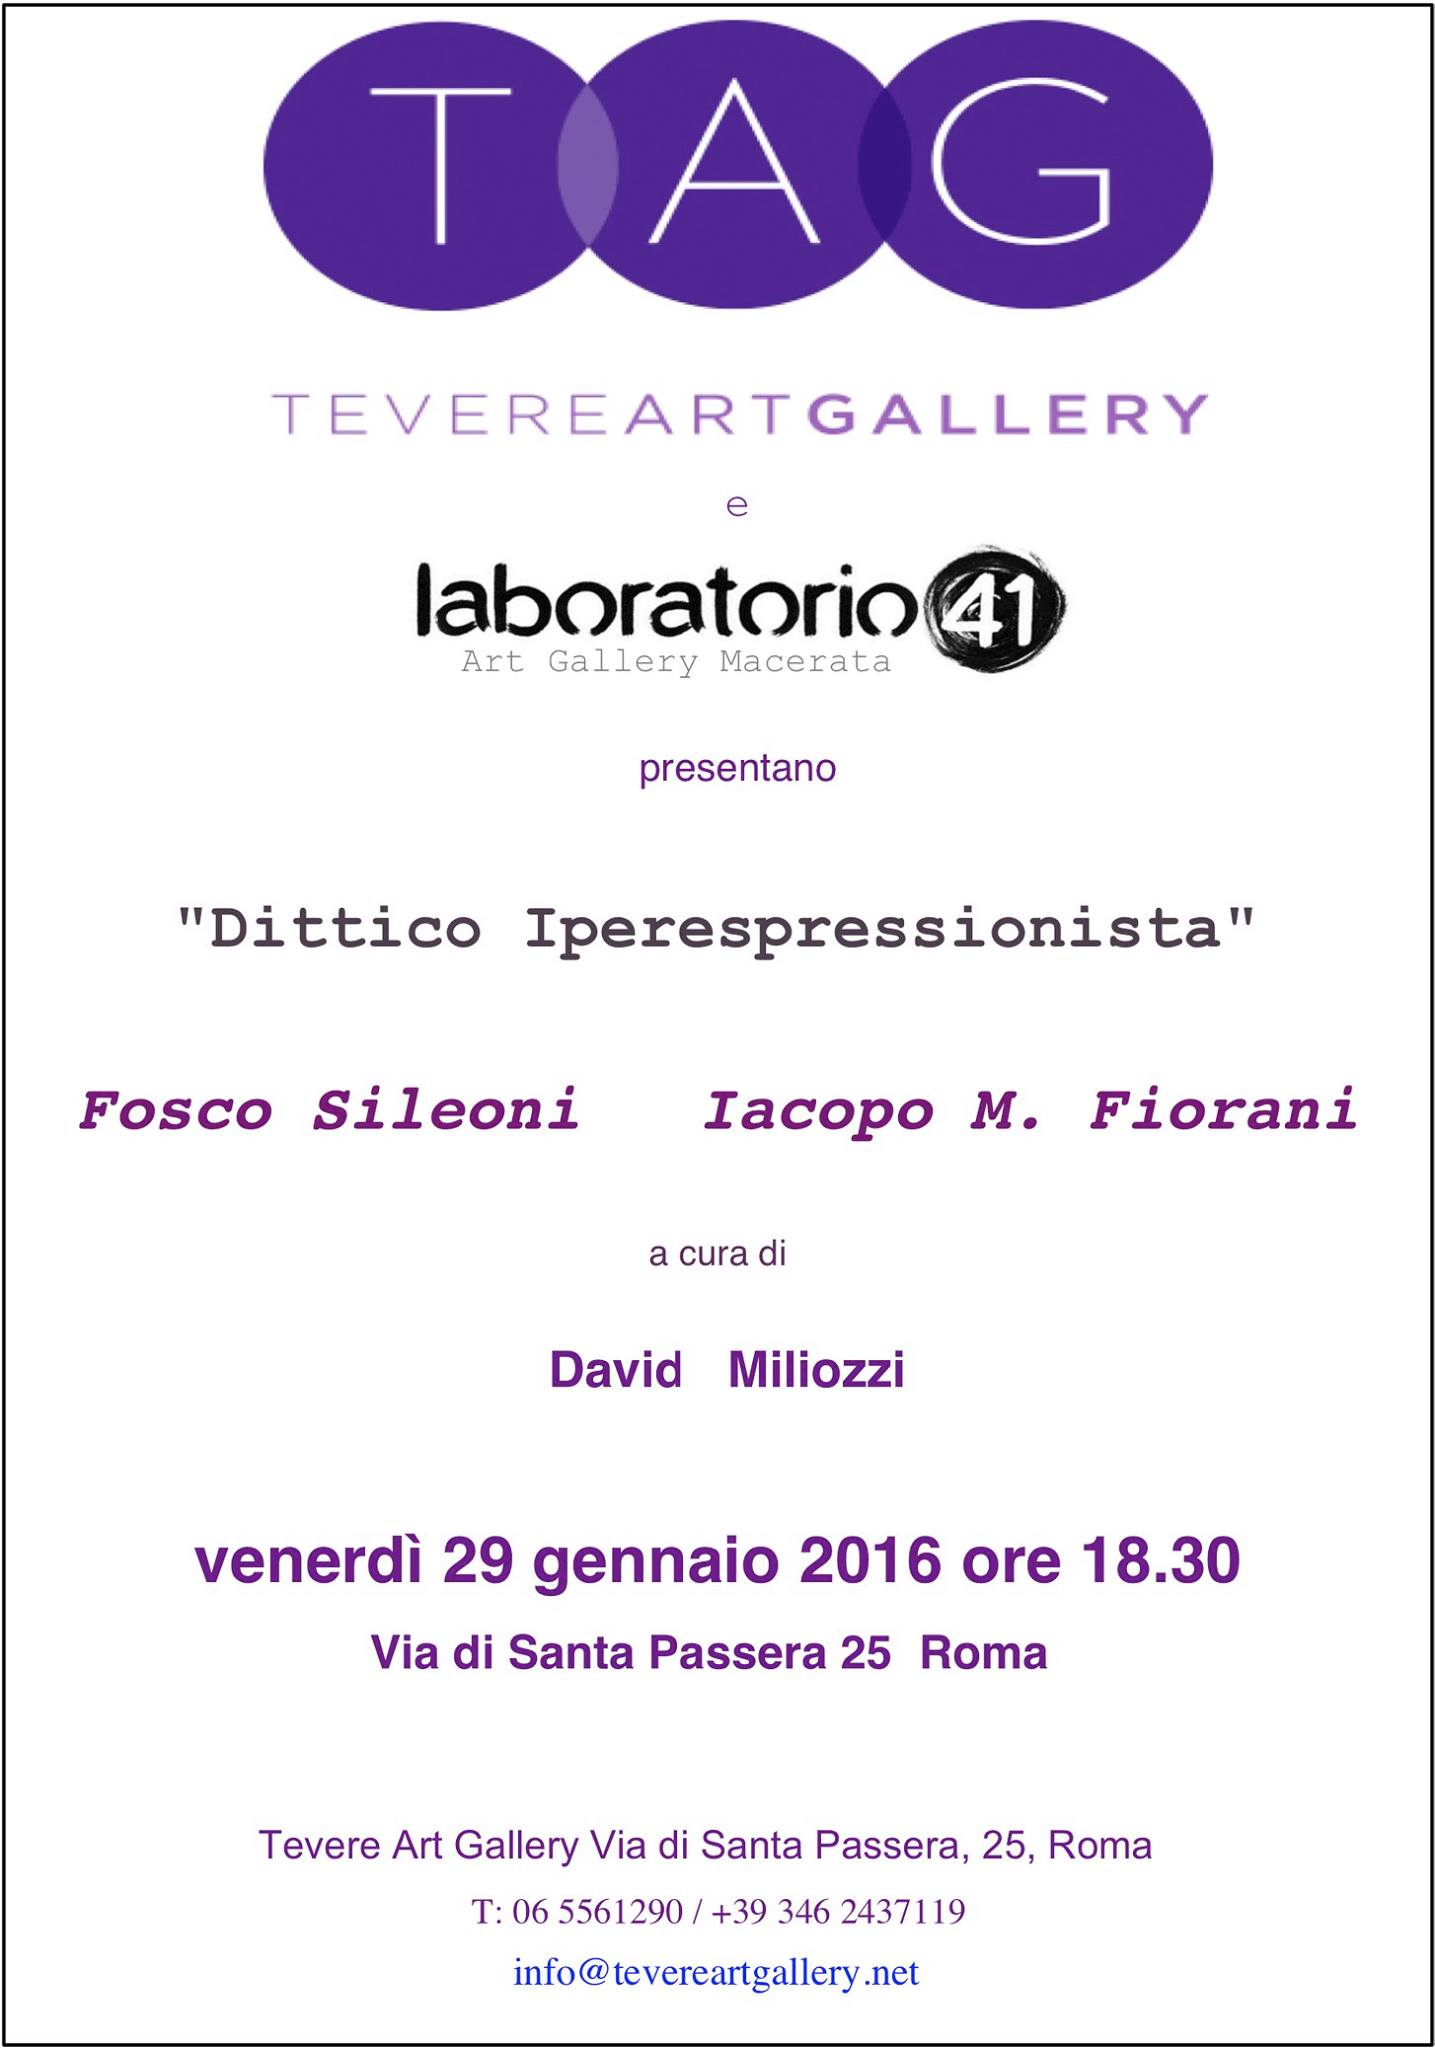 Dittico Iperespressionista - Tevere Art Gallery - Roma